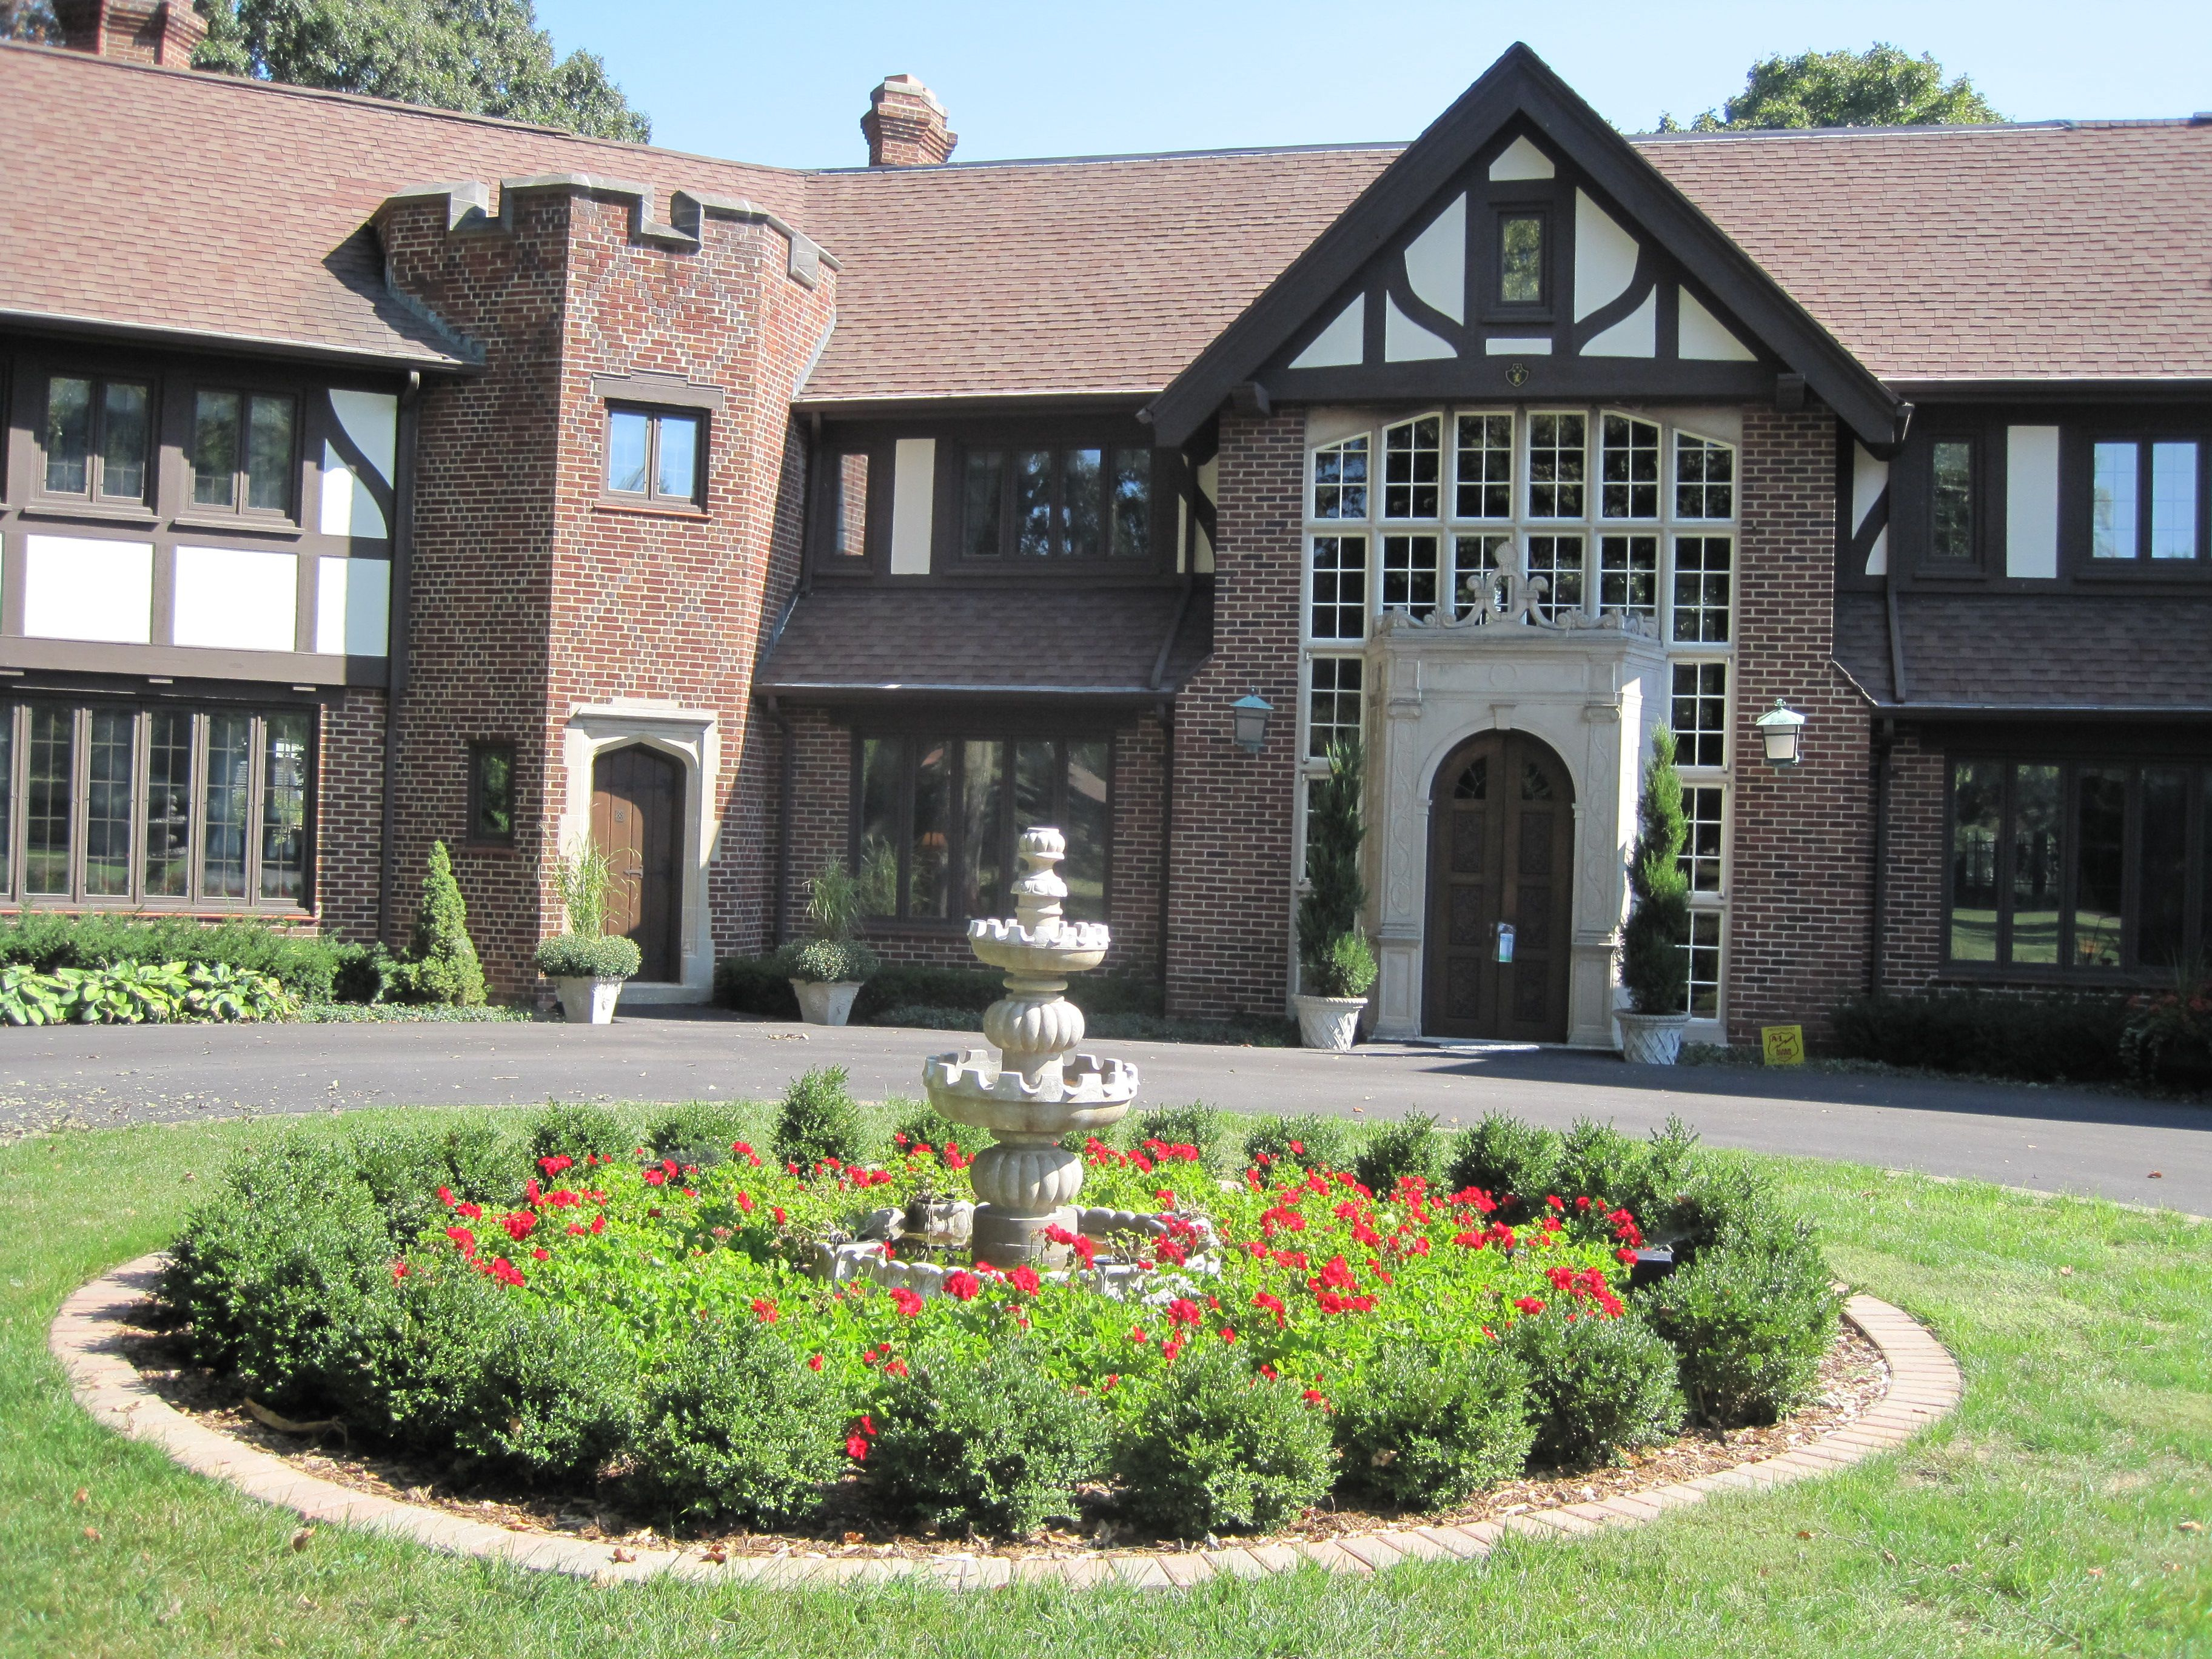 Illinois/macoupin county/brighton - North State St Also Known As Millionaires Row Monticello Il